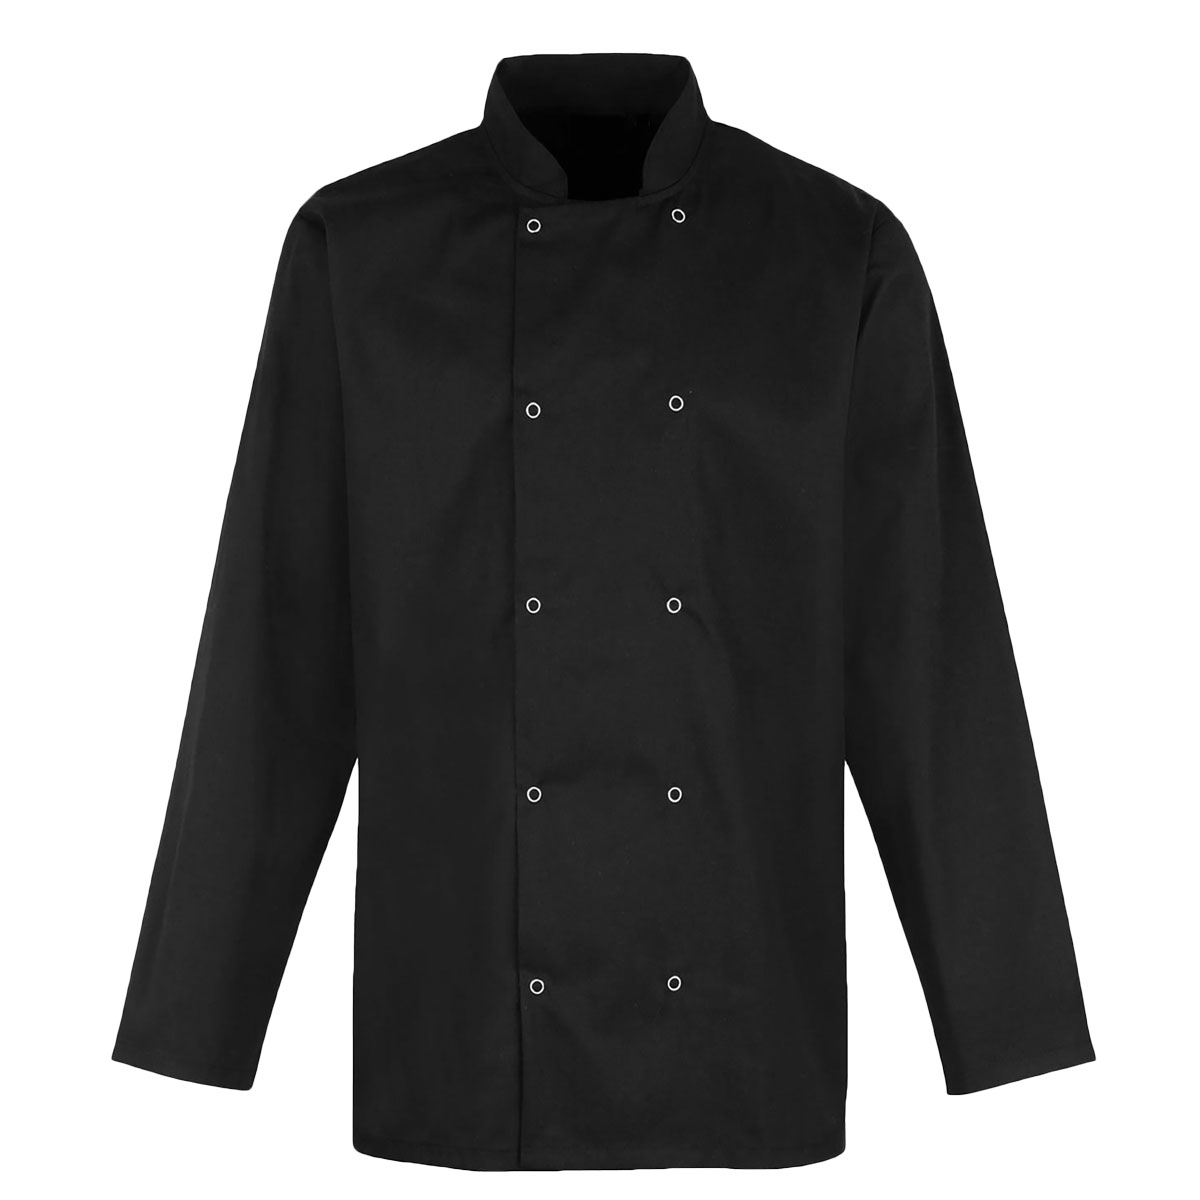 Value Chefs Jacket Unisex Long Sleeve - CCJ2-Black